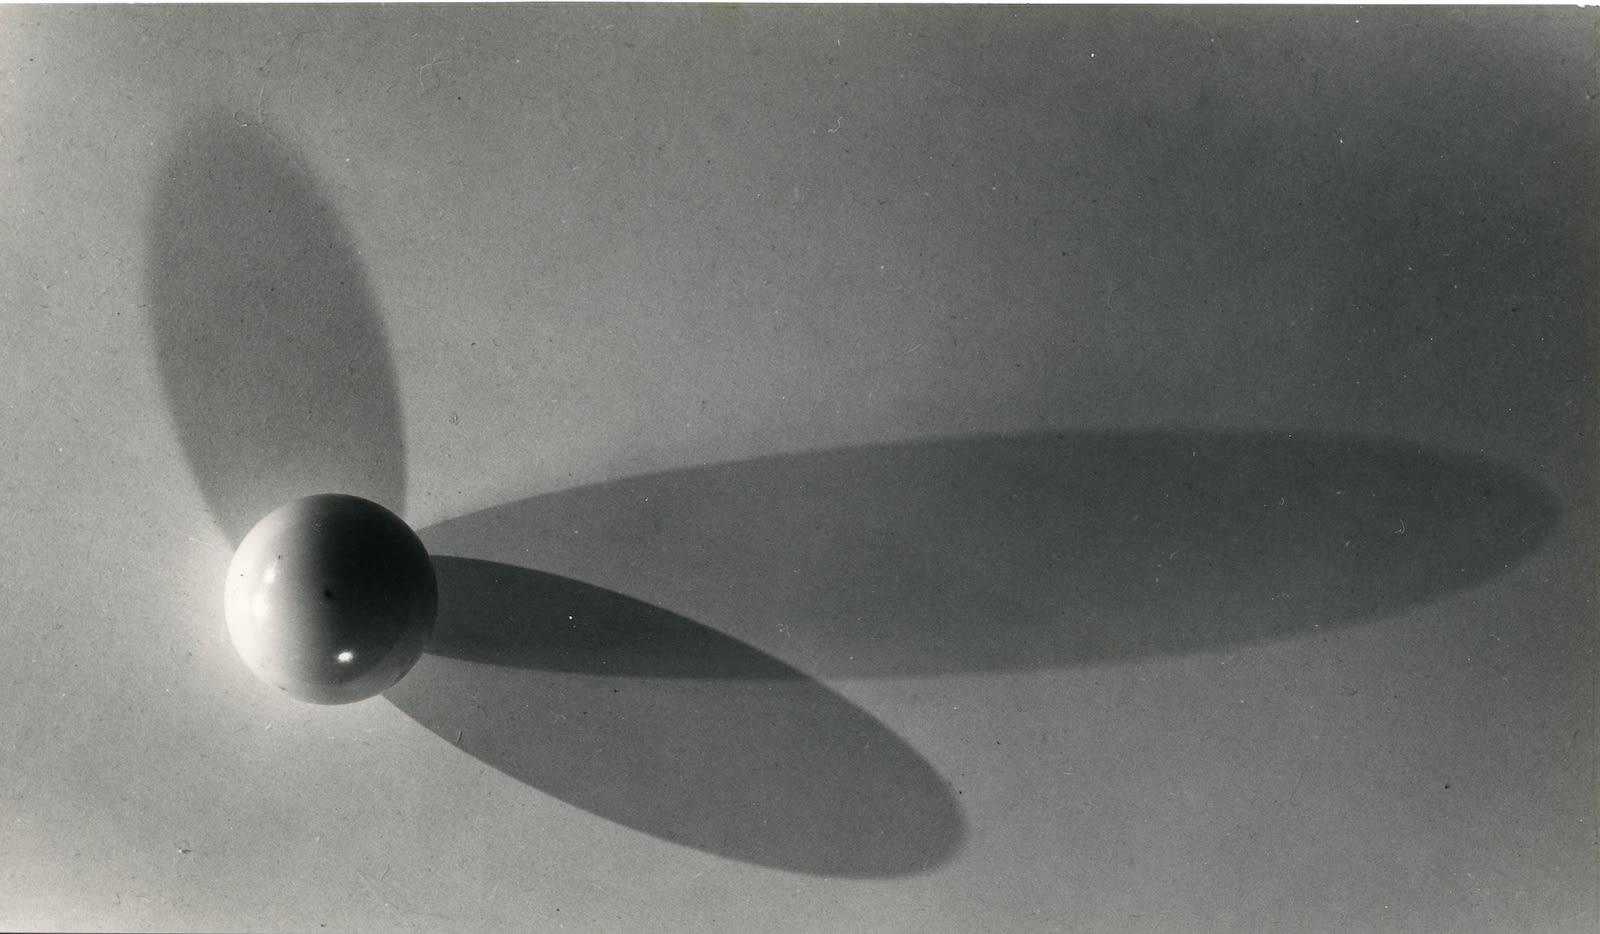 Berenice Abbott, Elliptical shadows, 1958-61